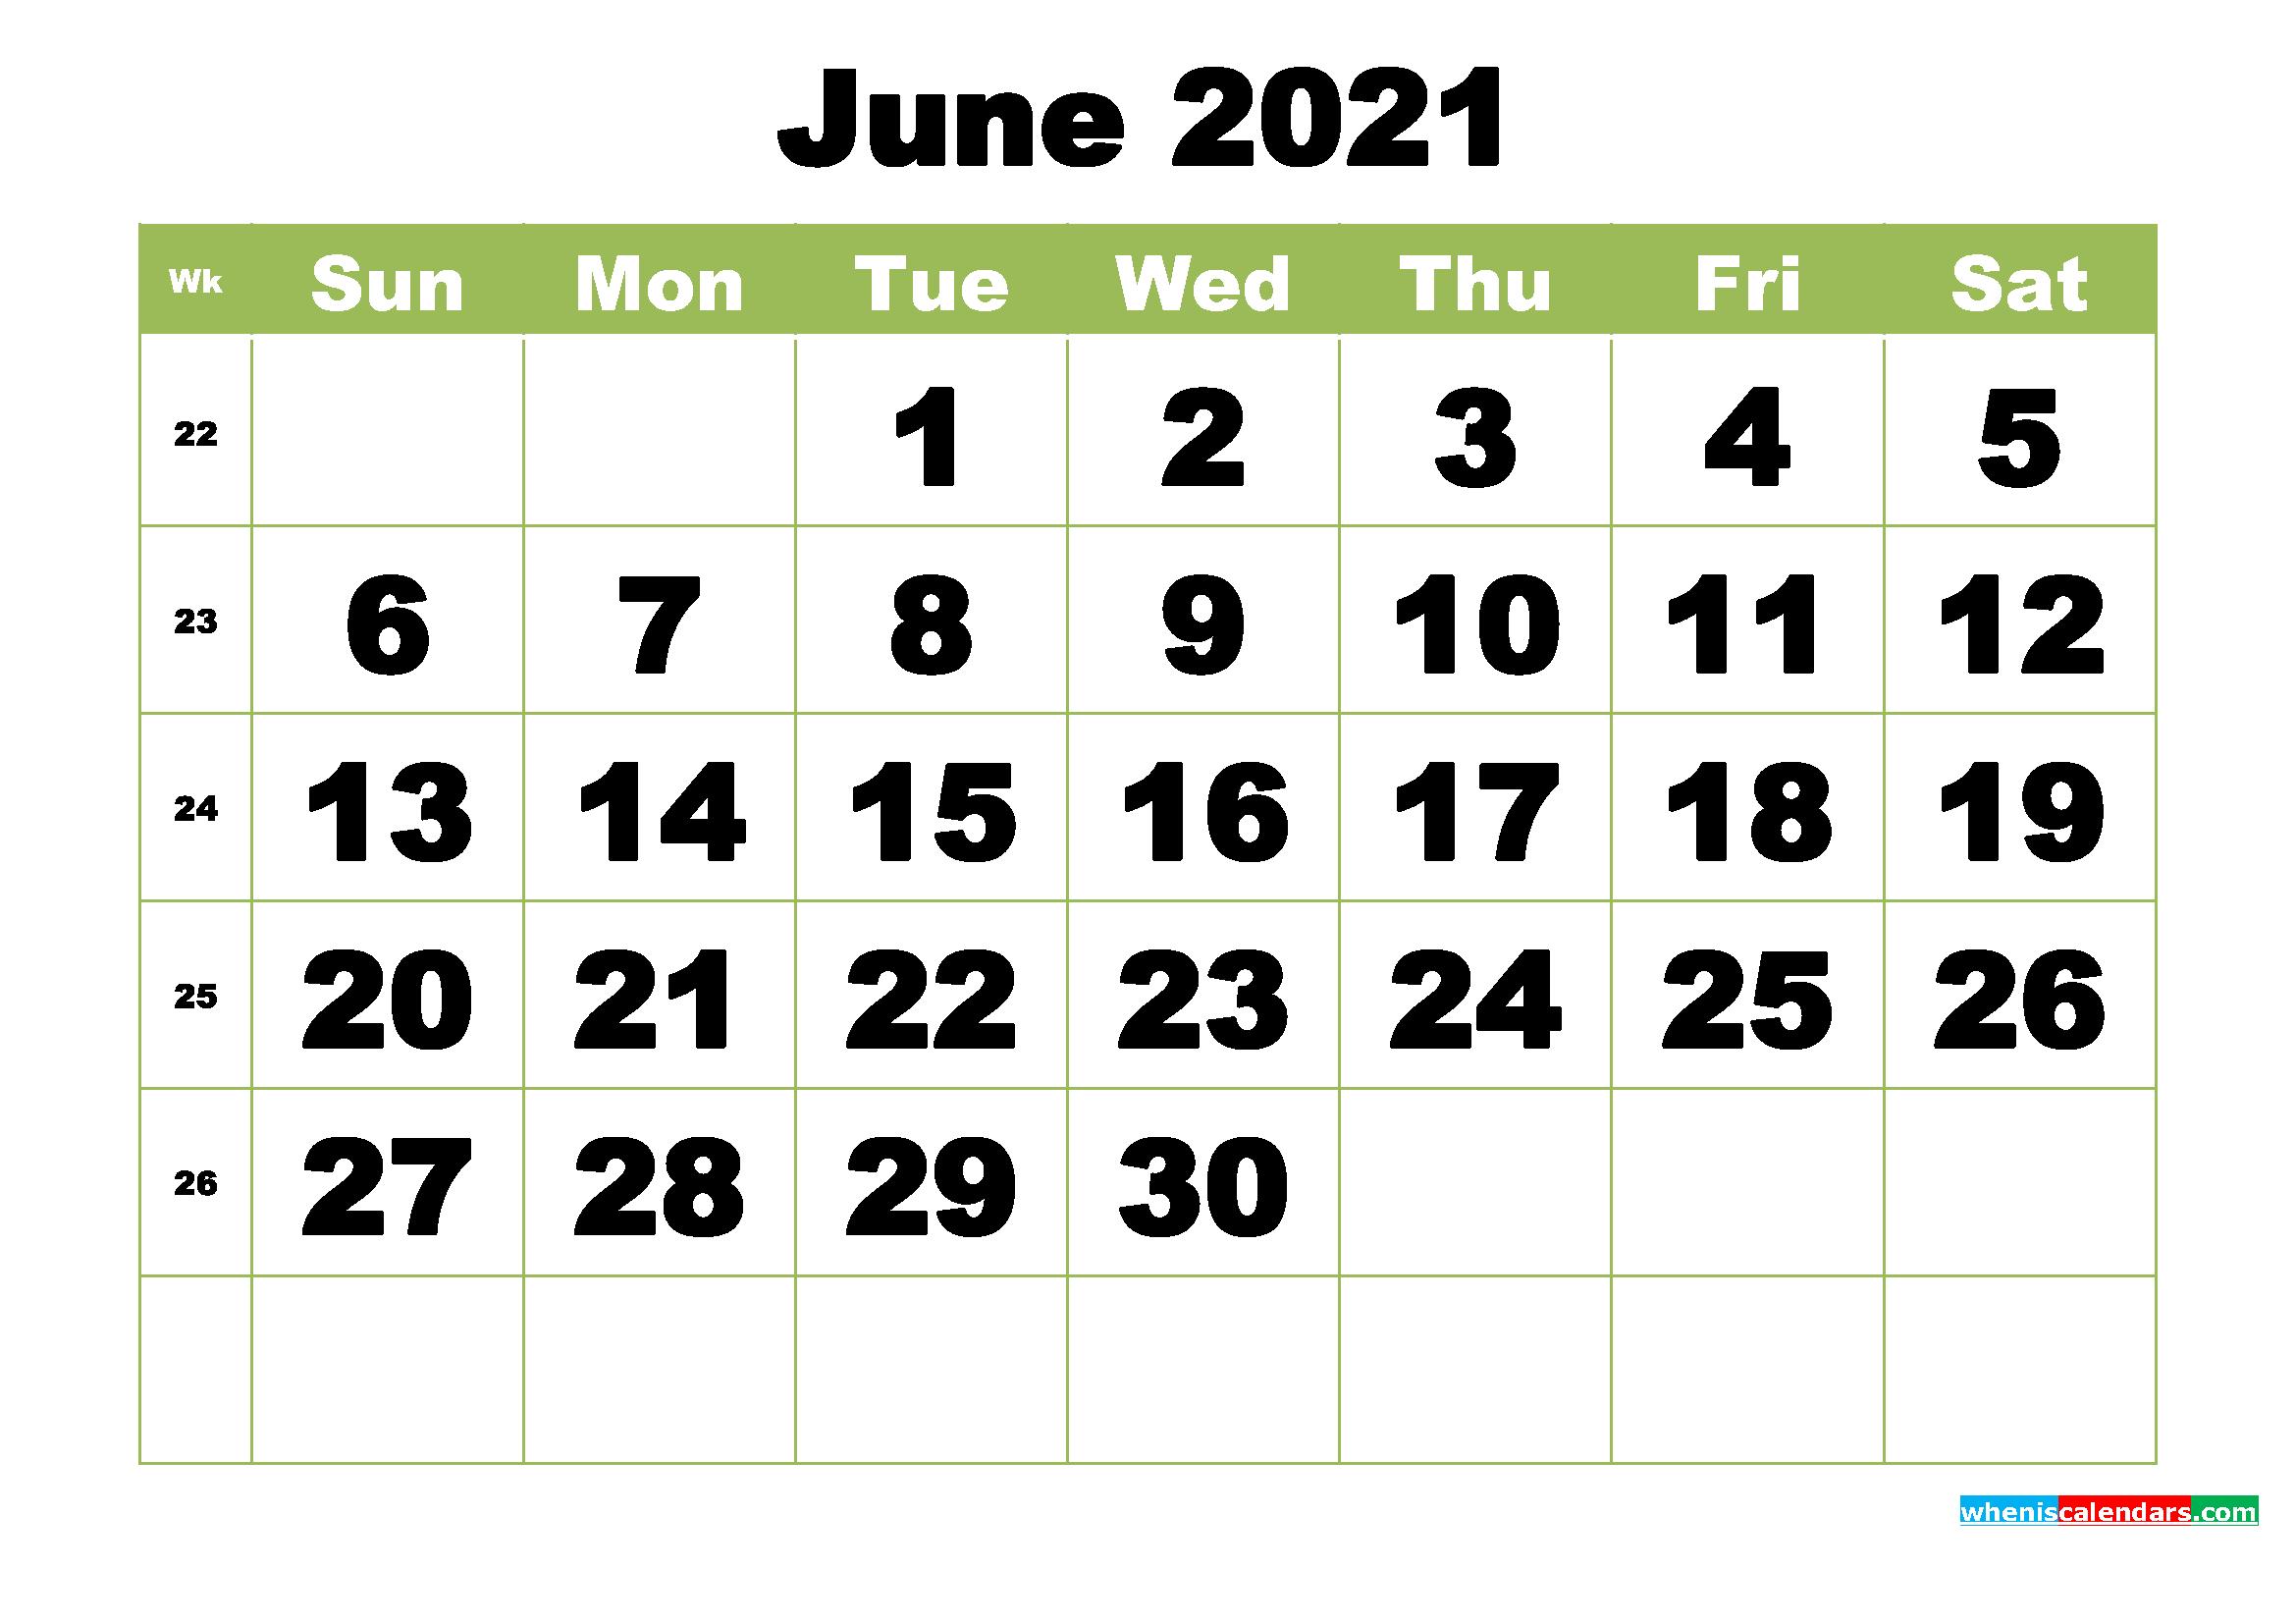 Free Printable Monthly Calendar June 2021 | Free Printable ...